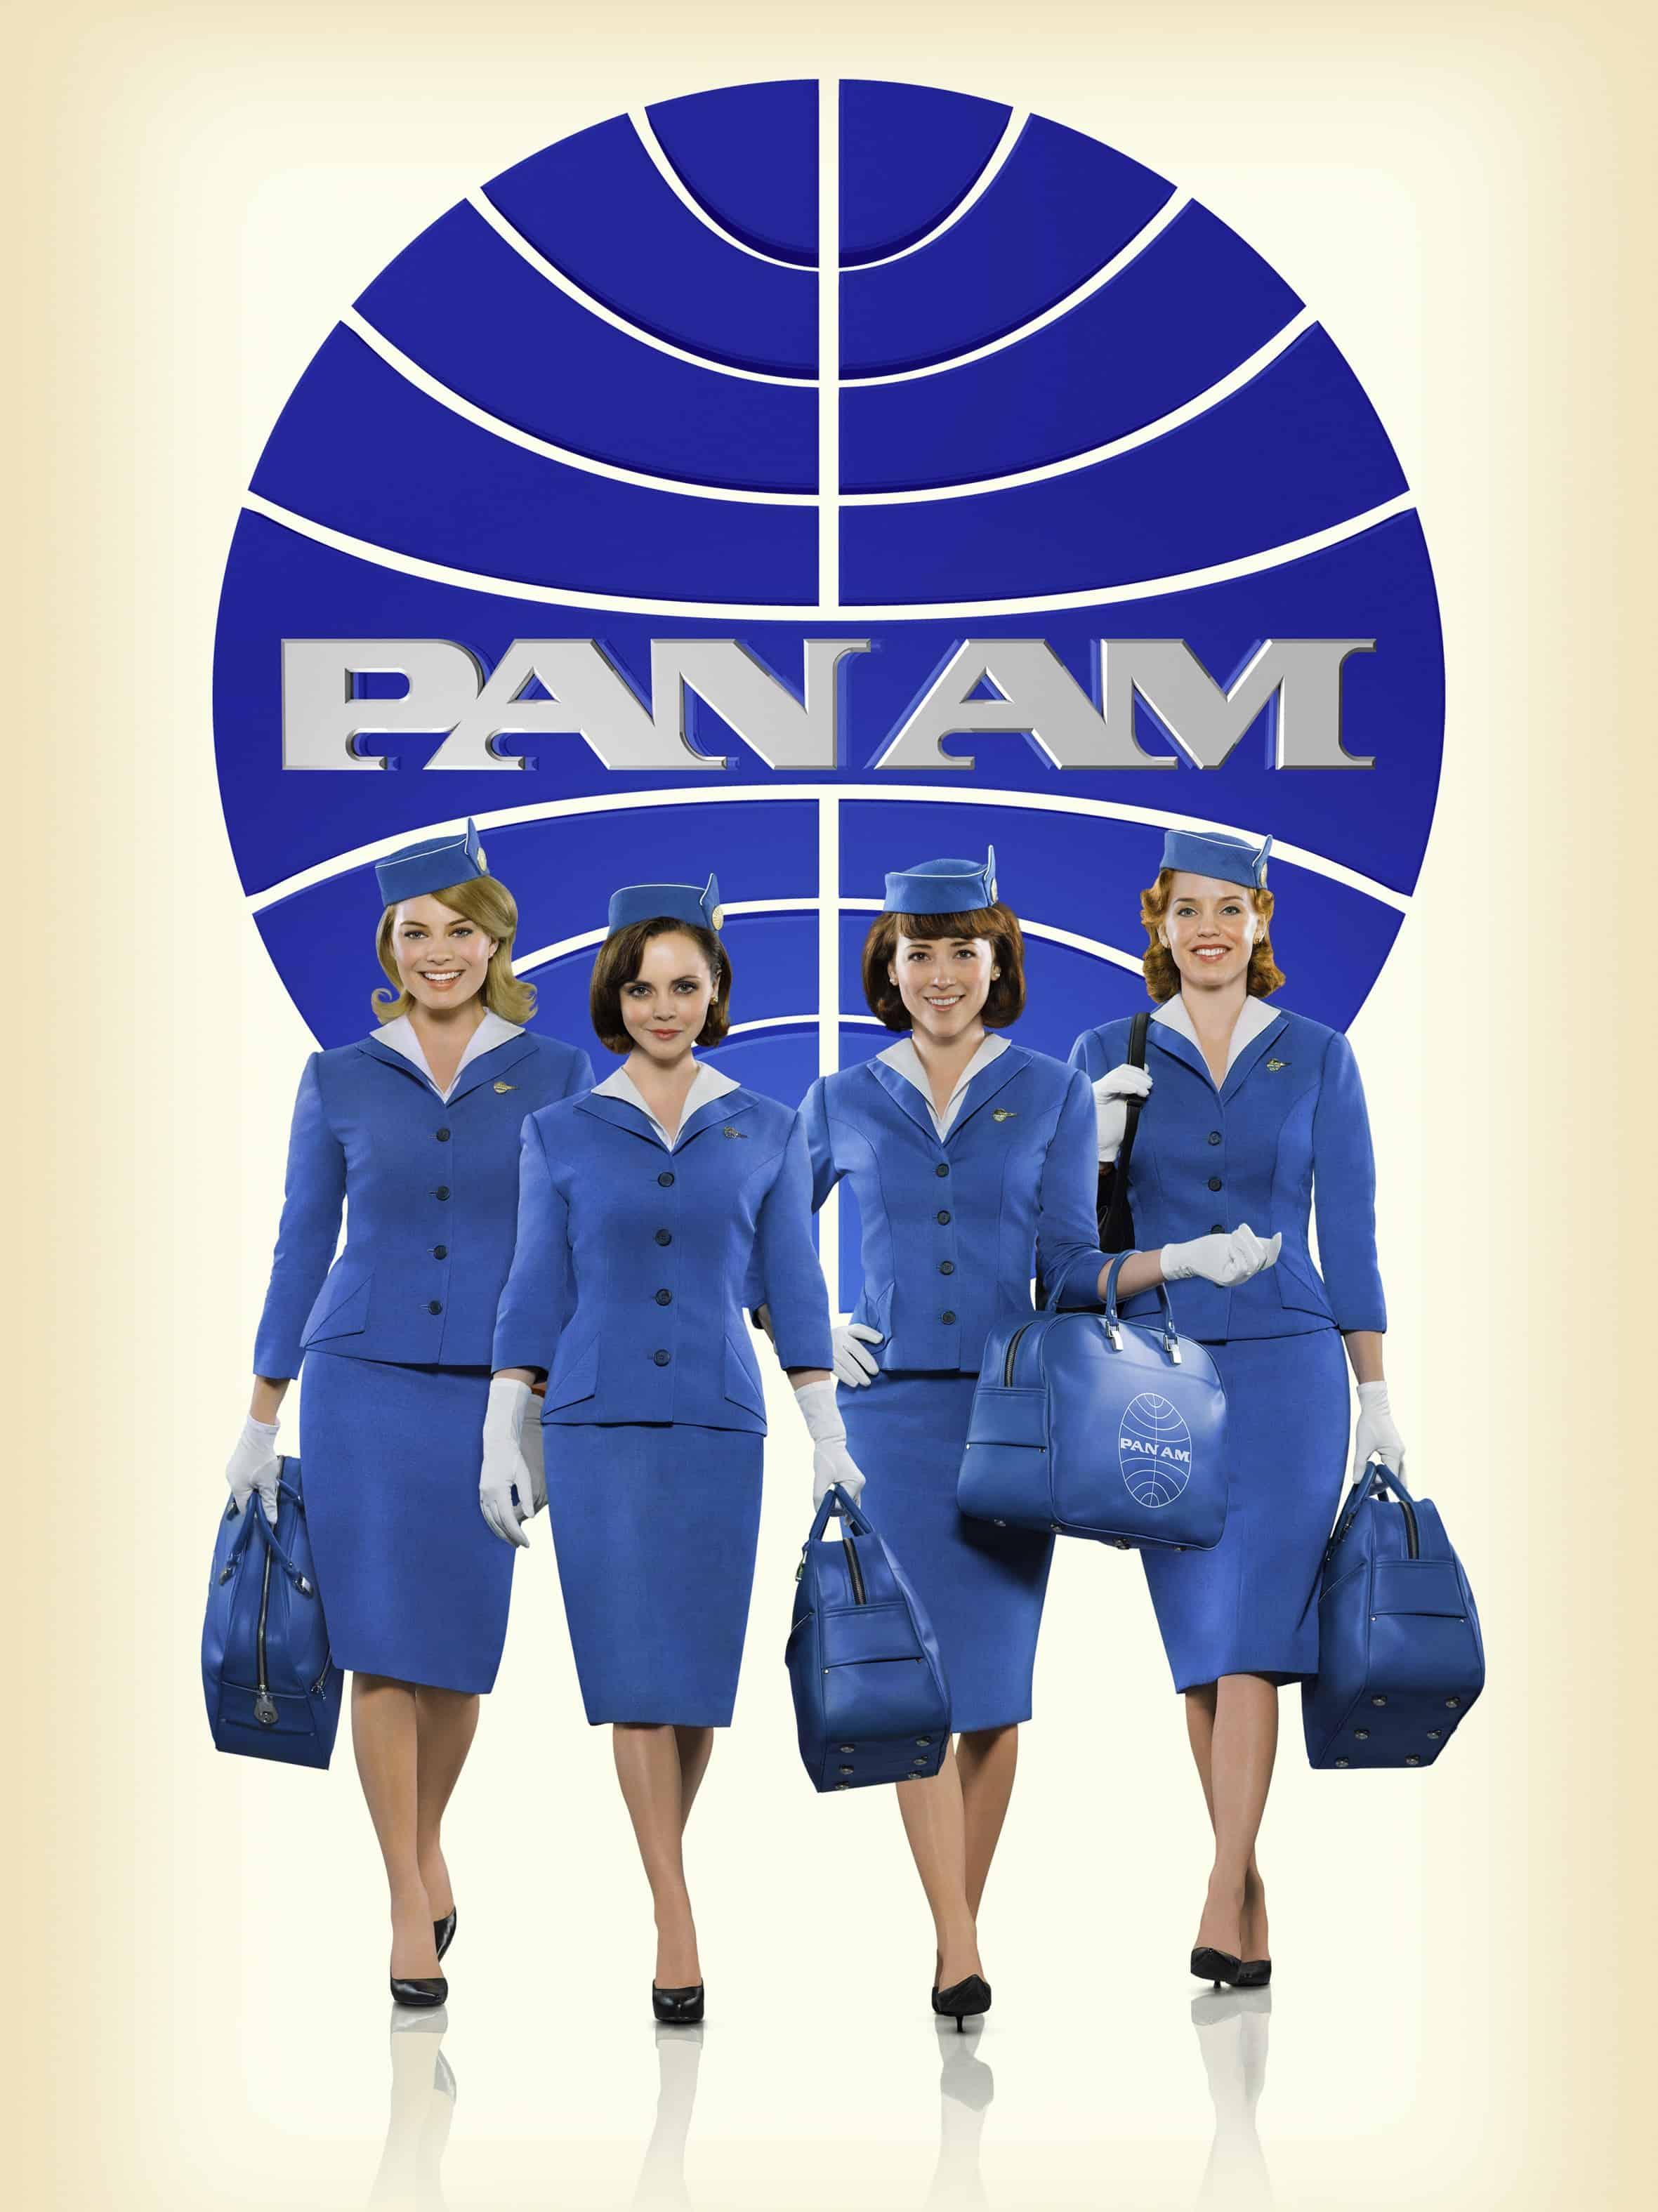 http://www.5minutesformom.com/wp-content/uploads/2011/09/panam_photo.jpg